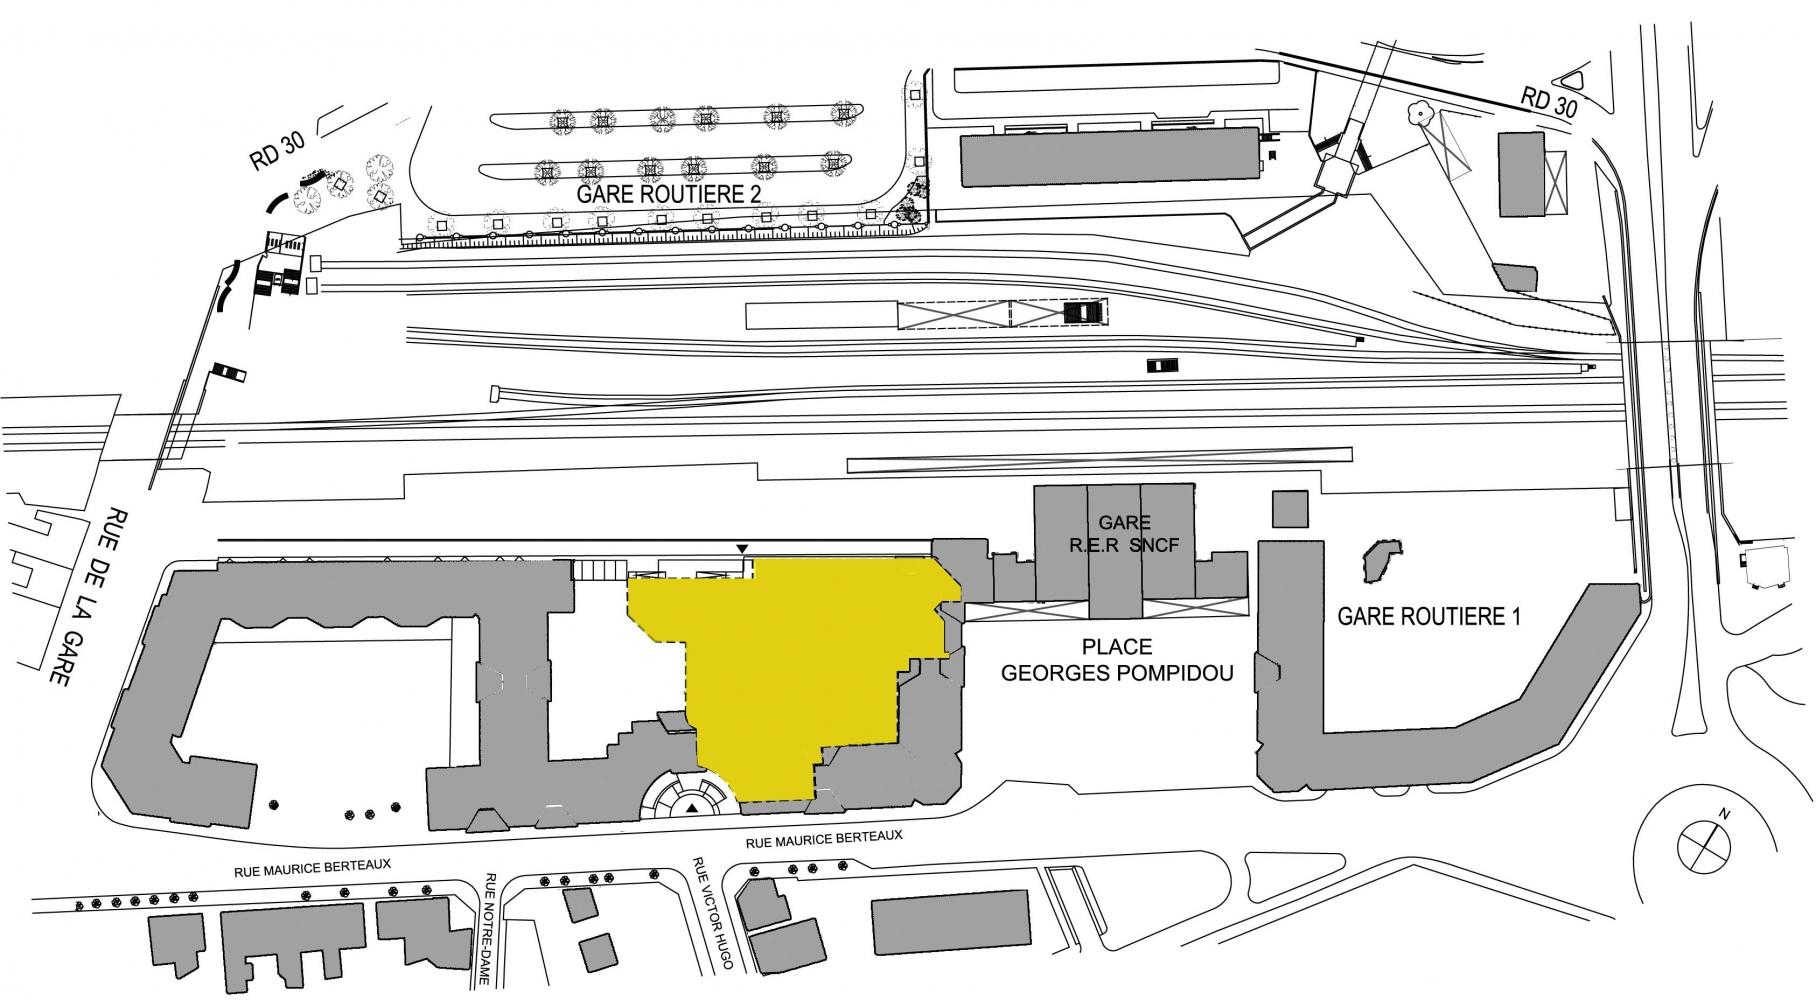 13-poissy-img-002 Pascale SEURIN Architecte - Pascale SEURIN Architecte